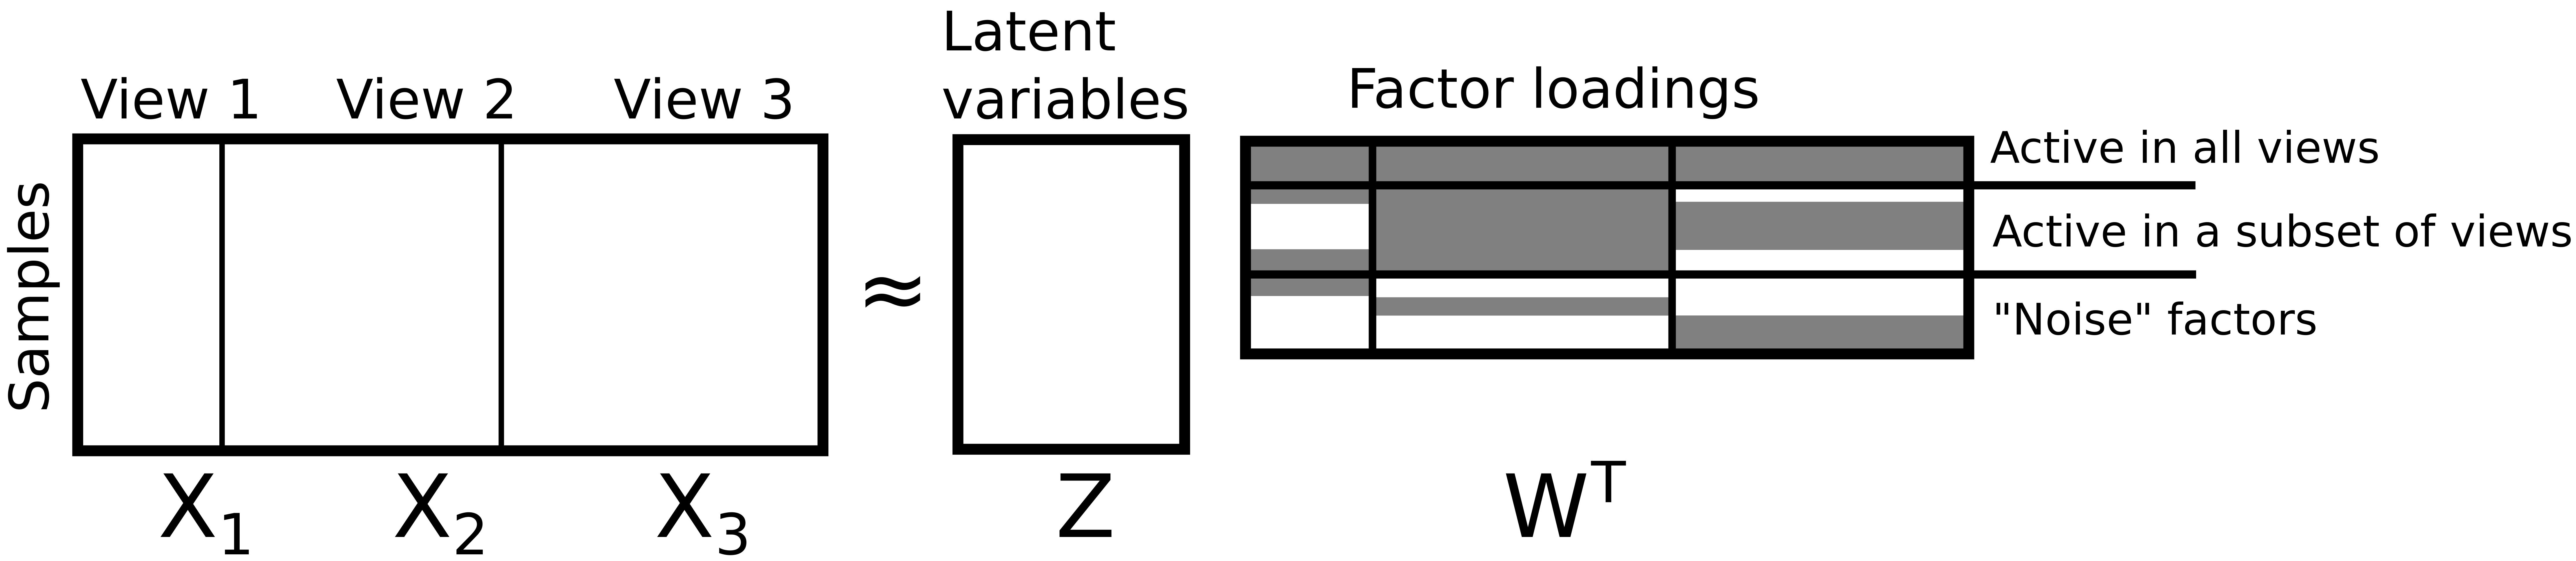 Probabilistic Factor Analysis Methods